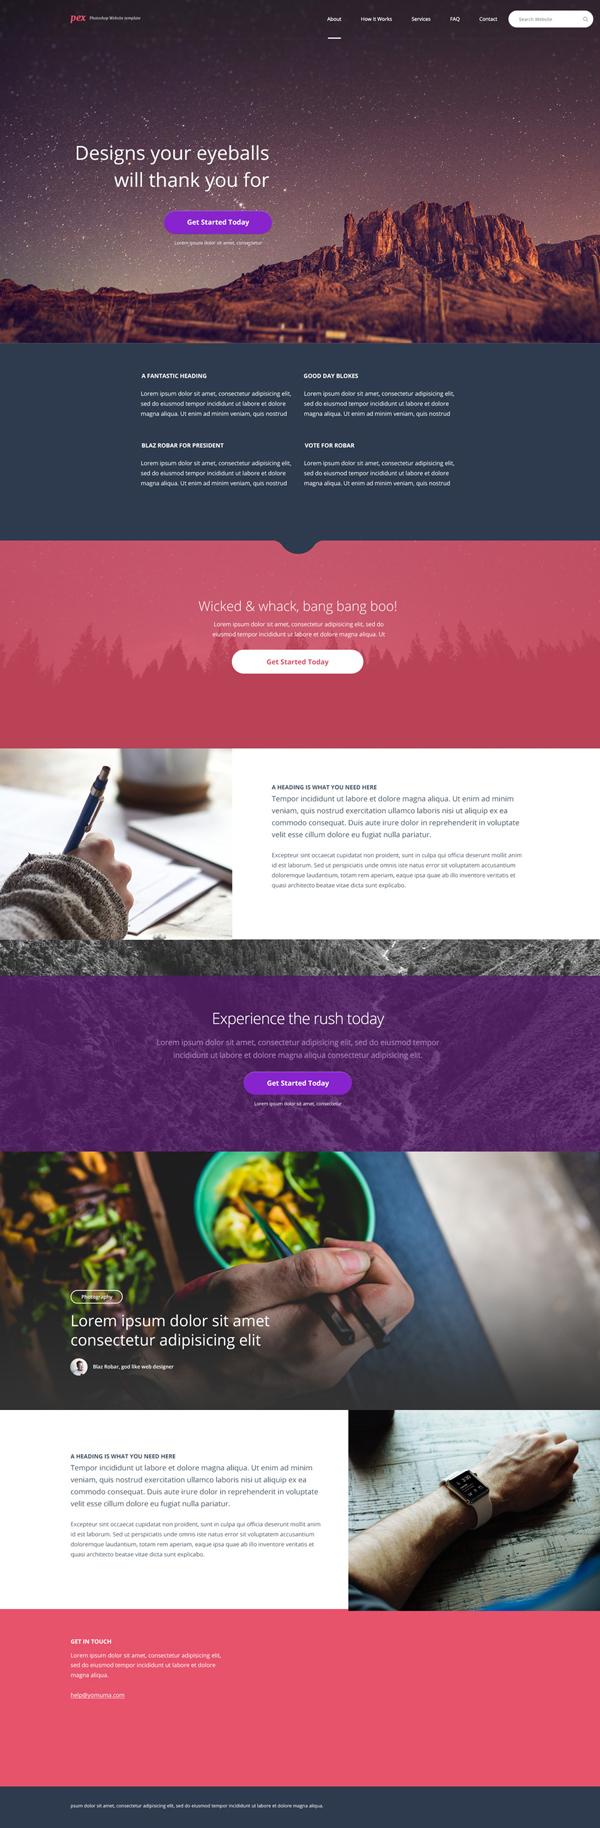 Free Single Page PSD Template